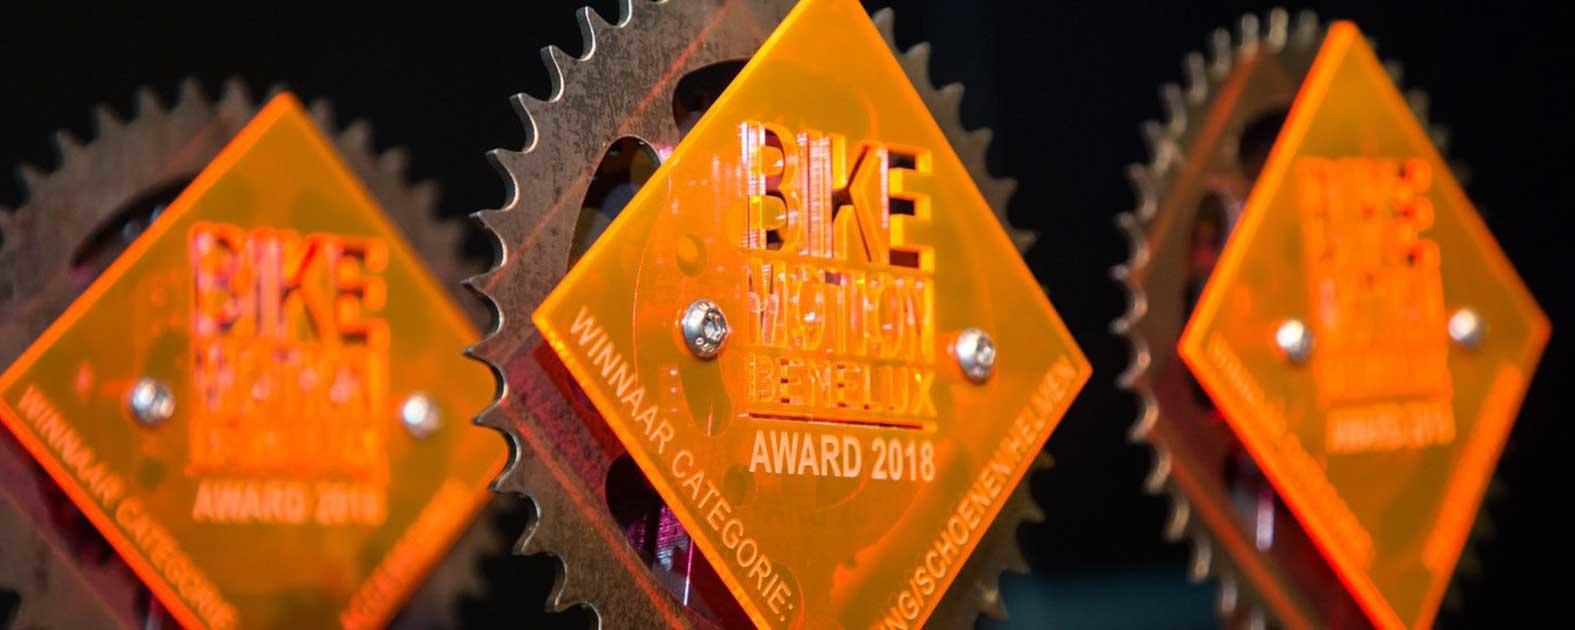 Bike Motion Award 2018